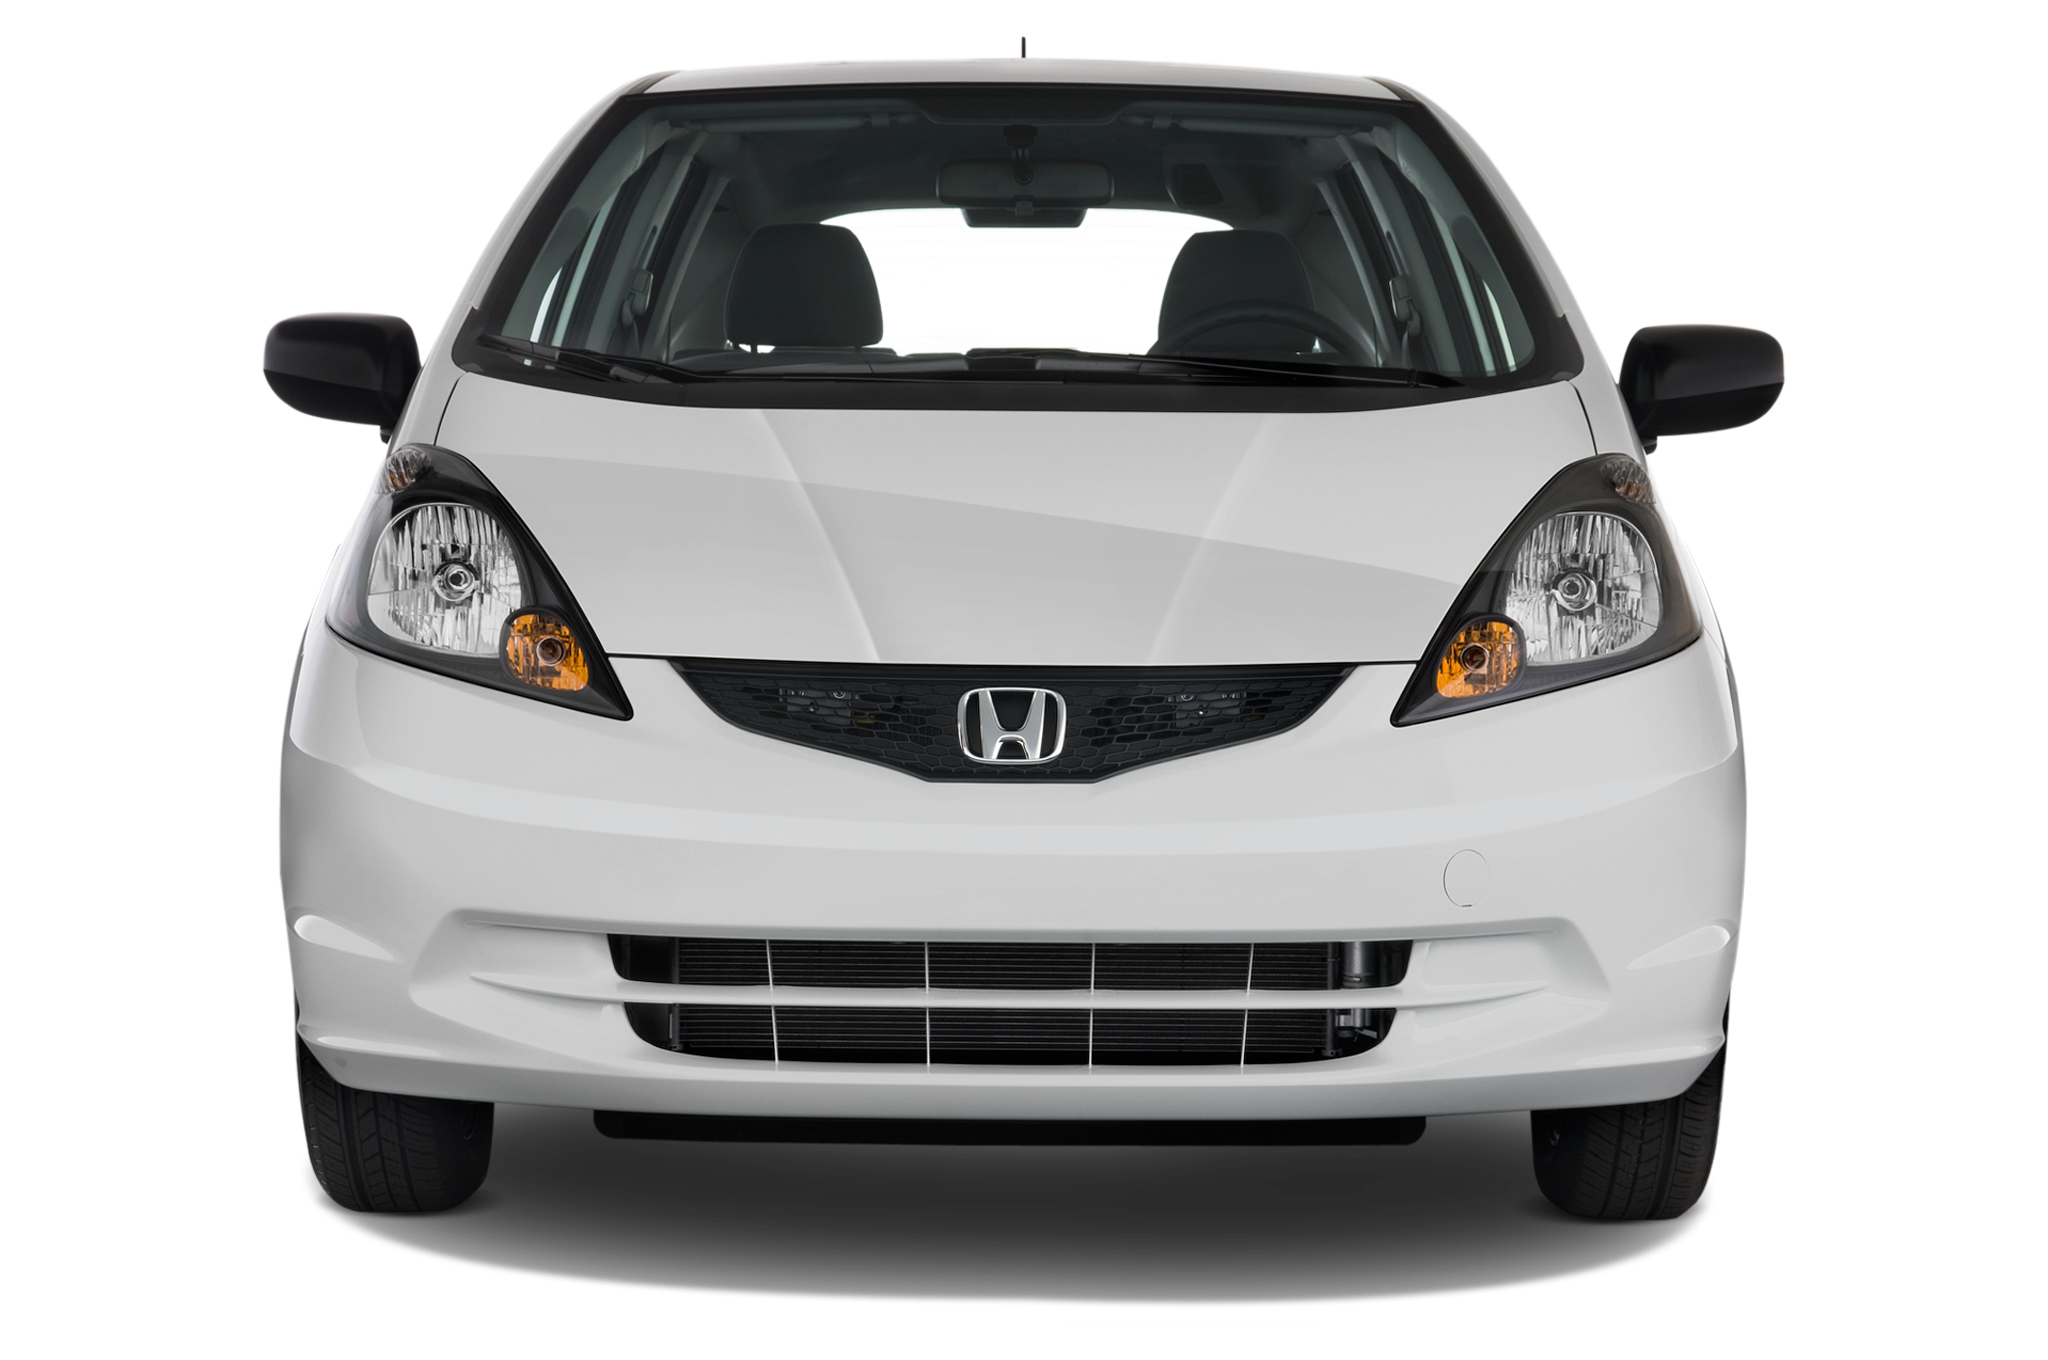 Honda Civic 2011 Autos Post